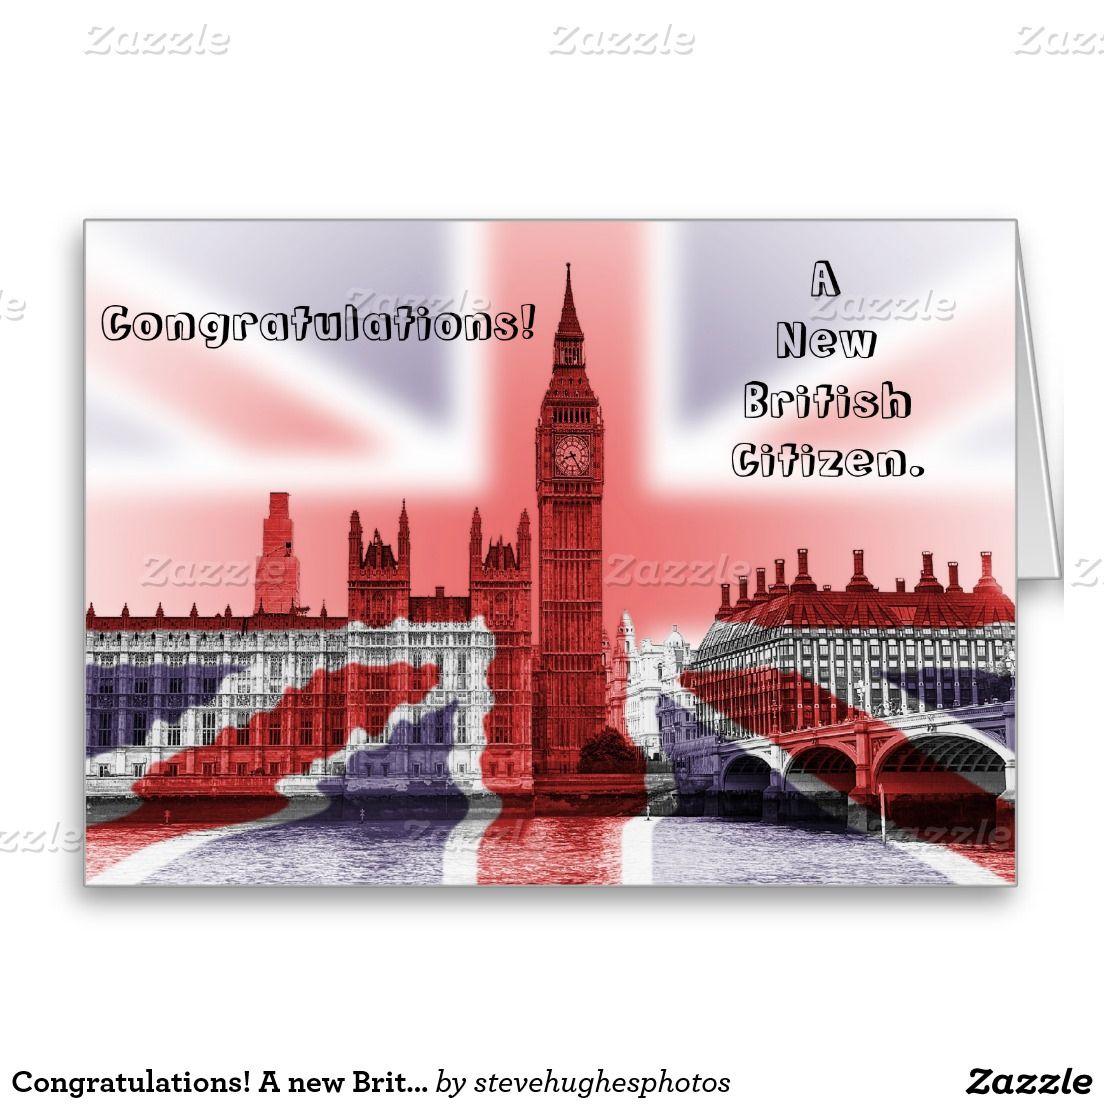 Congratulations a new british citizen card study abroad london a new british citizen greeting card m4hsunfo